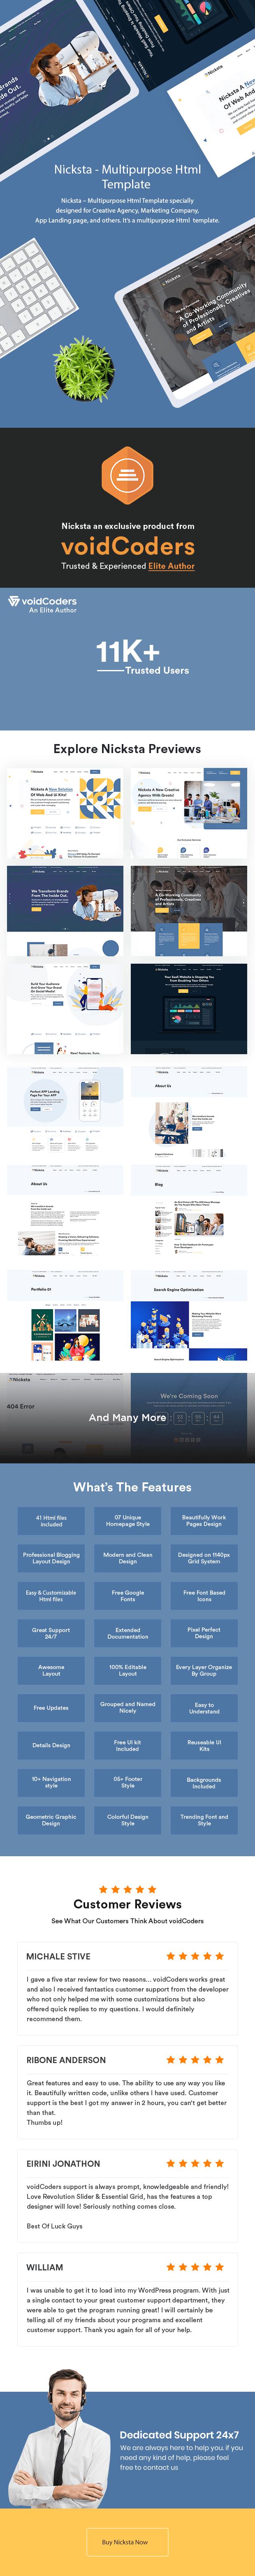 Nicksta - Multipurpose HTML5 Template - 1